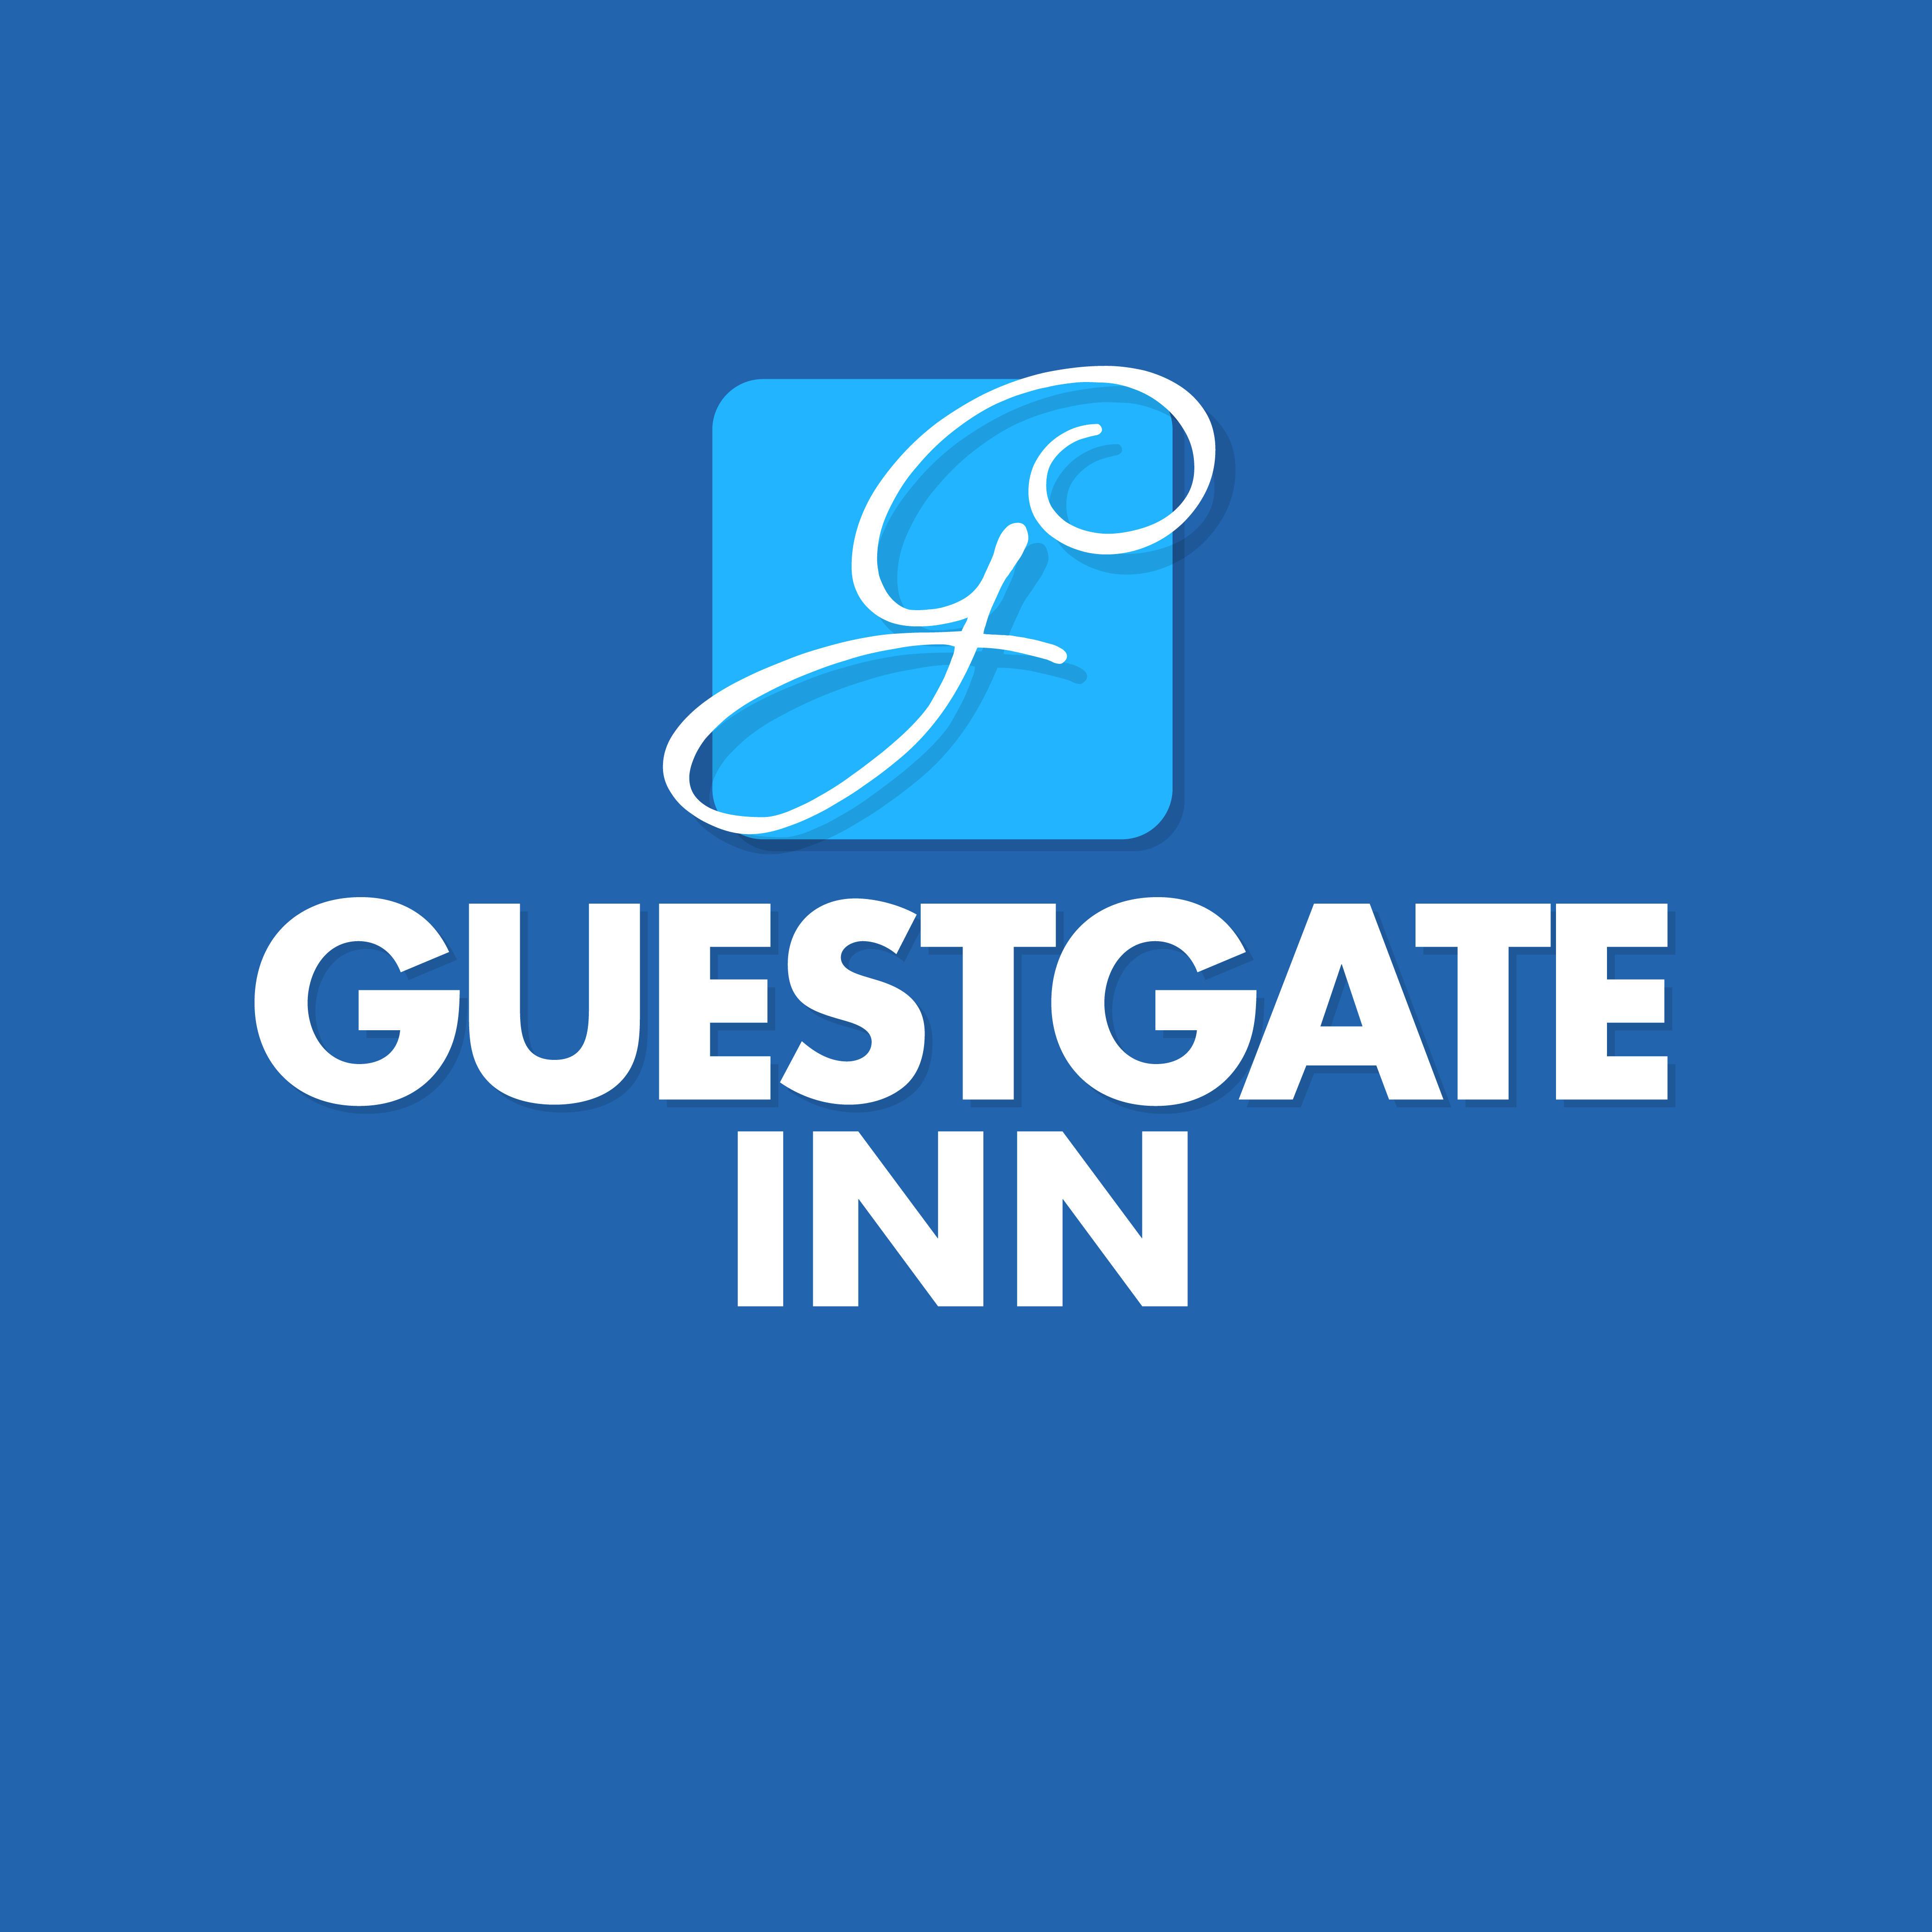 Guestgate Inn image 6